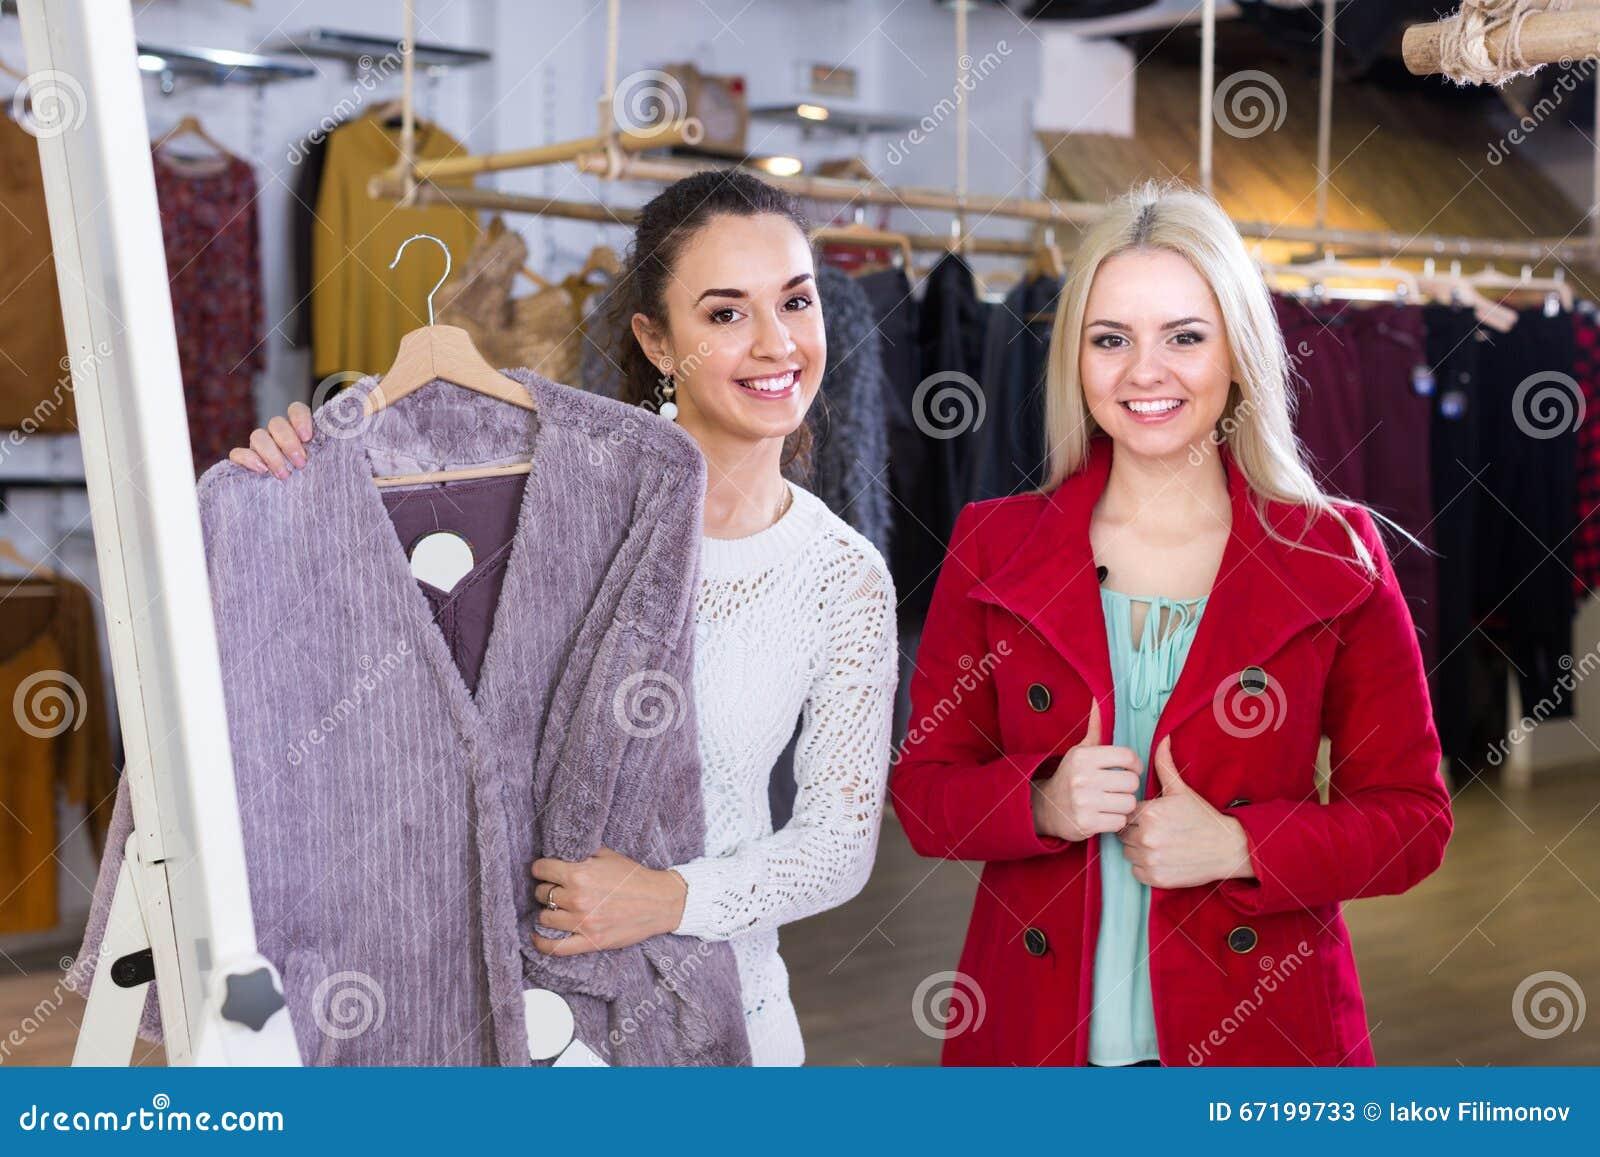 Girls Clothing Shop